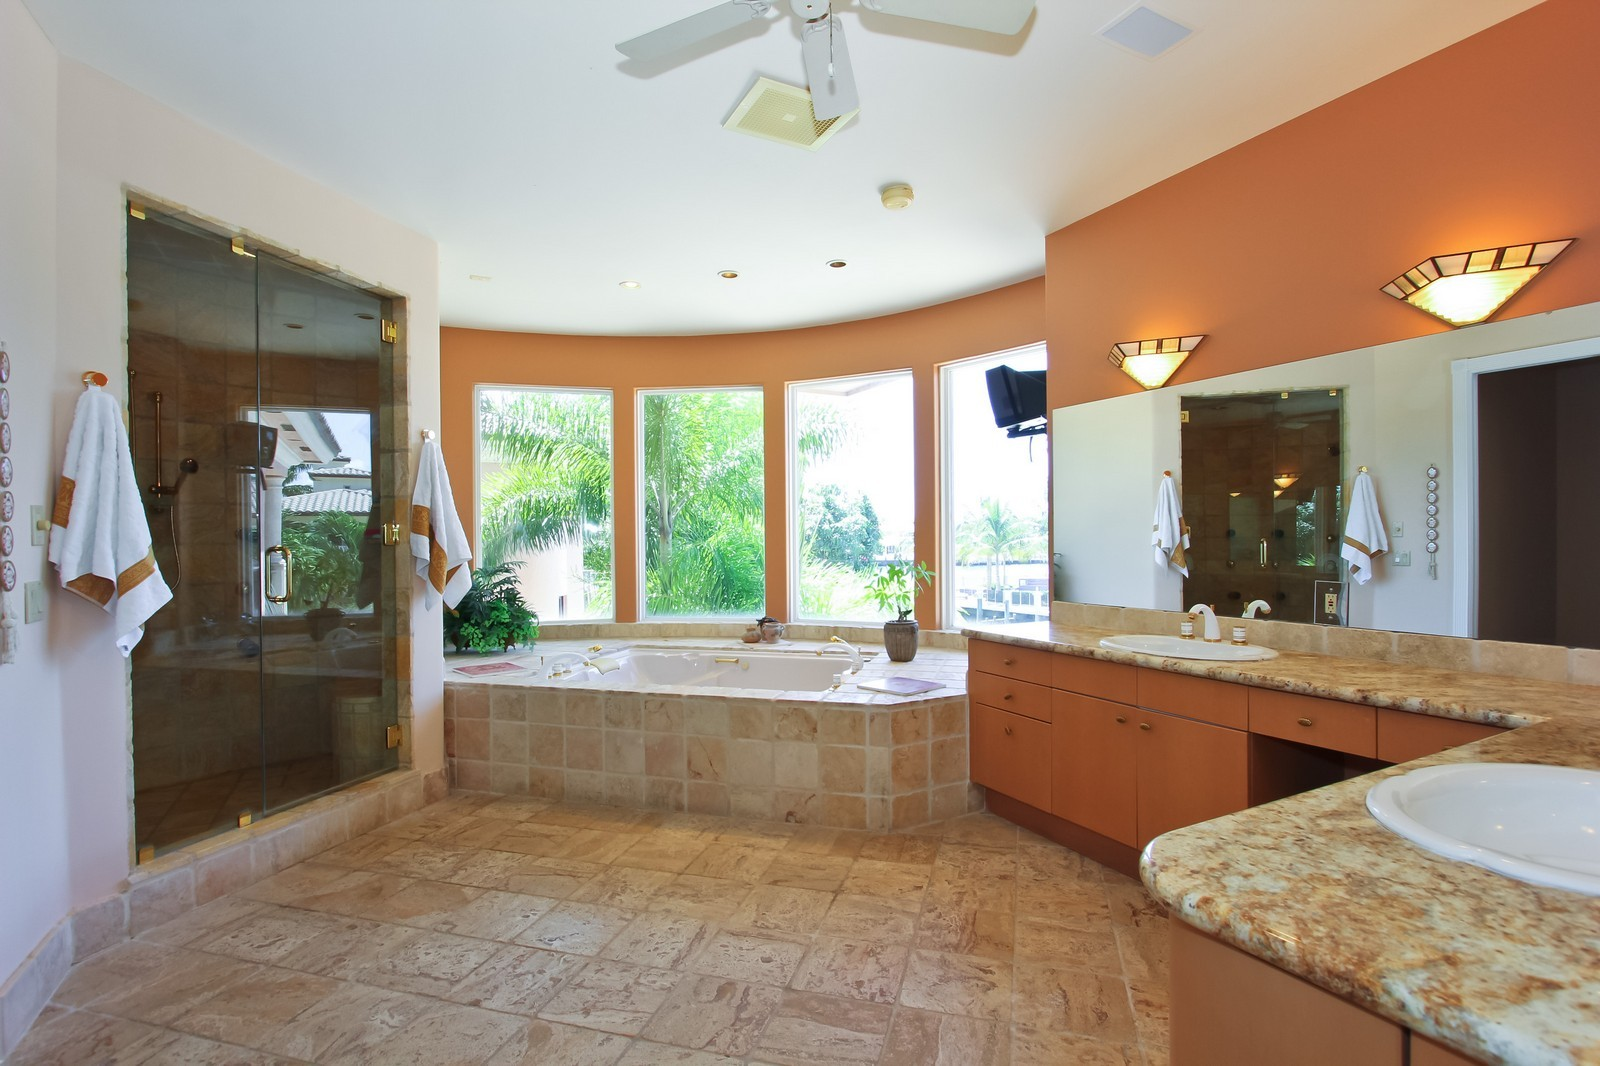 Real Estate Photography - 3310 NE 58th St, Fort Lauderdale, FL, 33308 - Master Bathroom